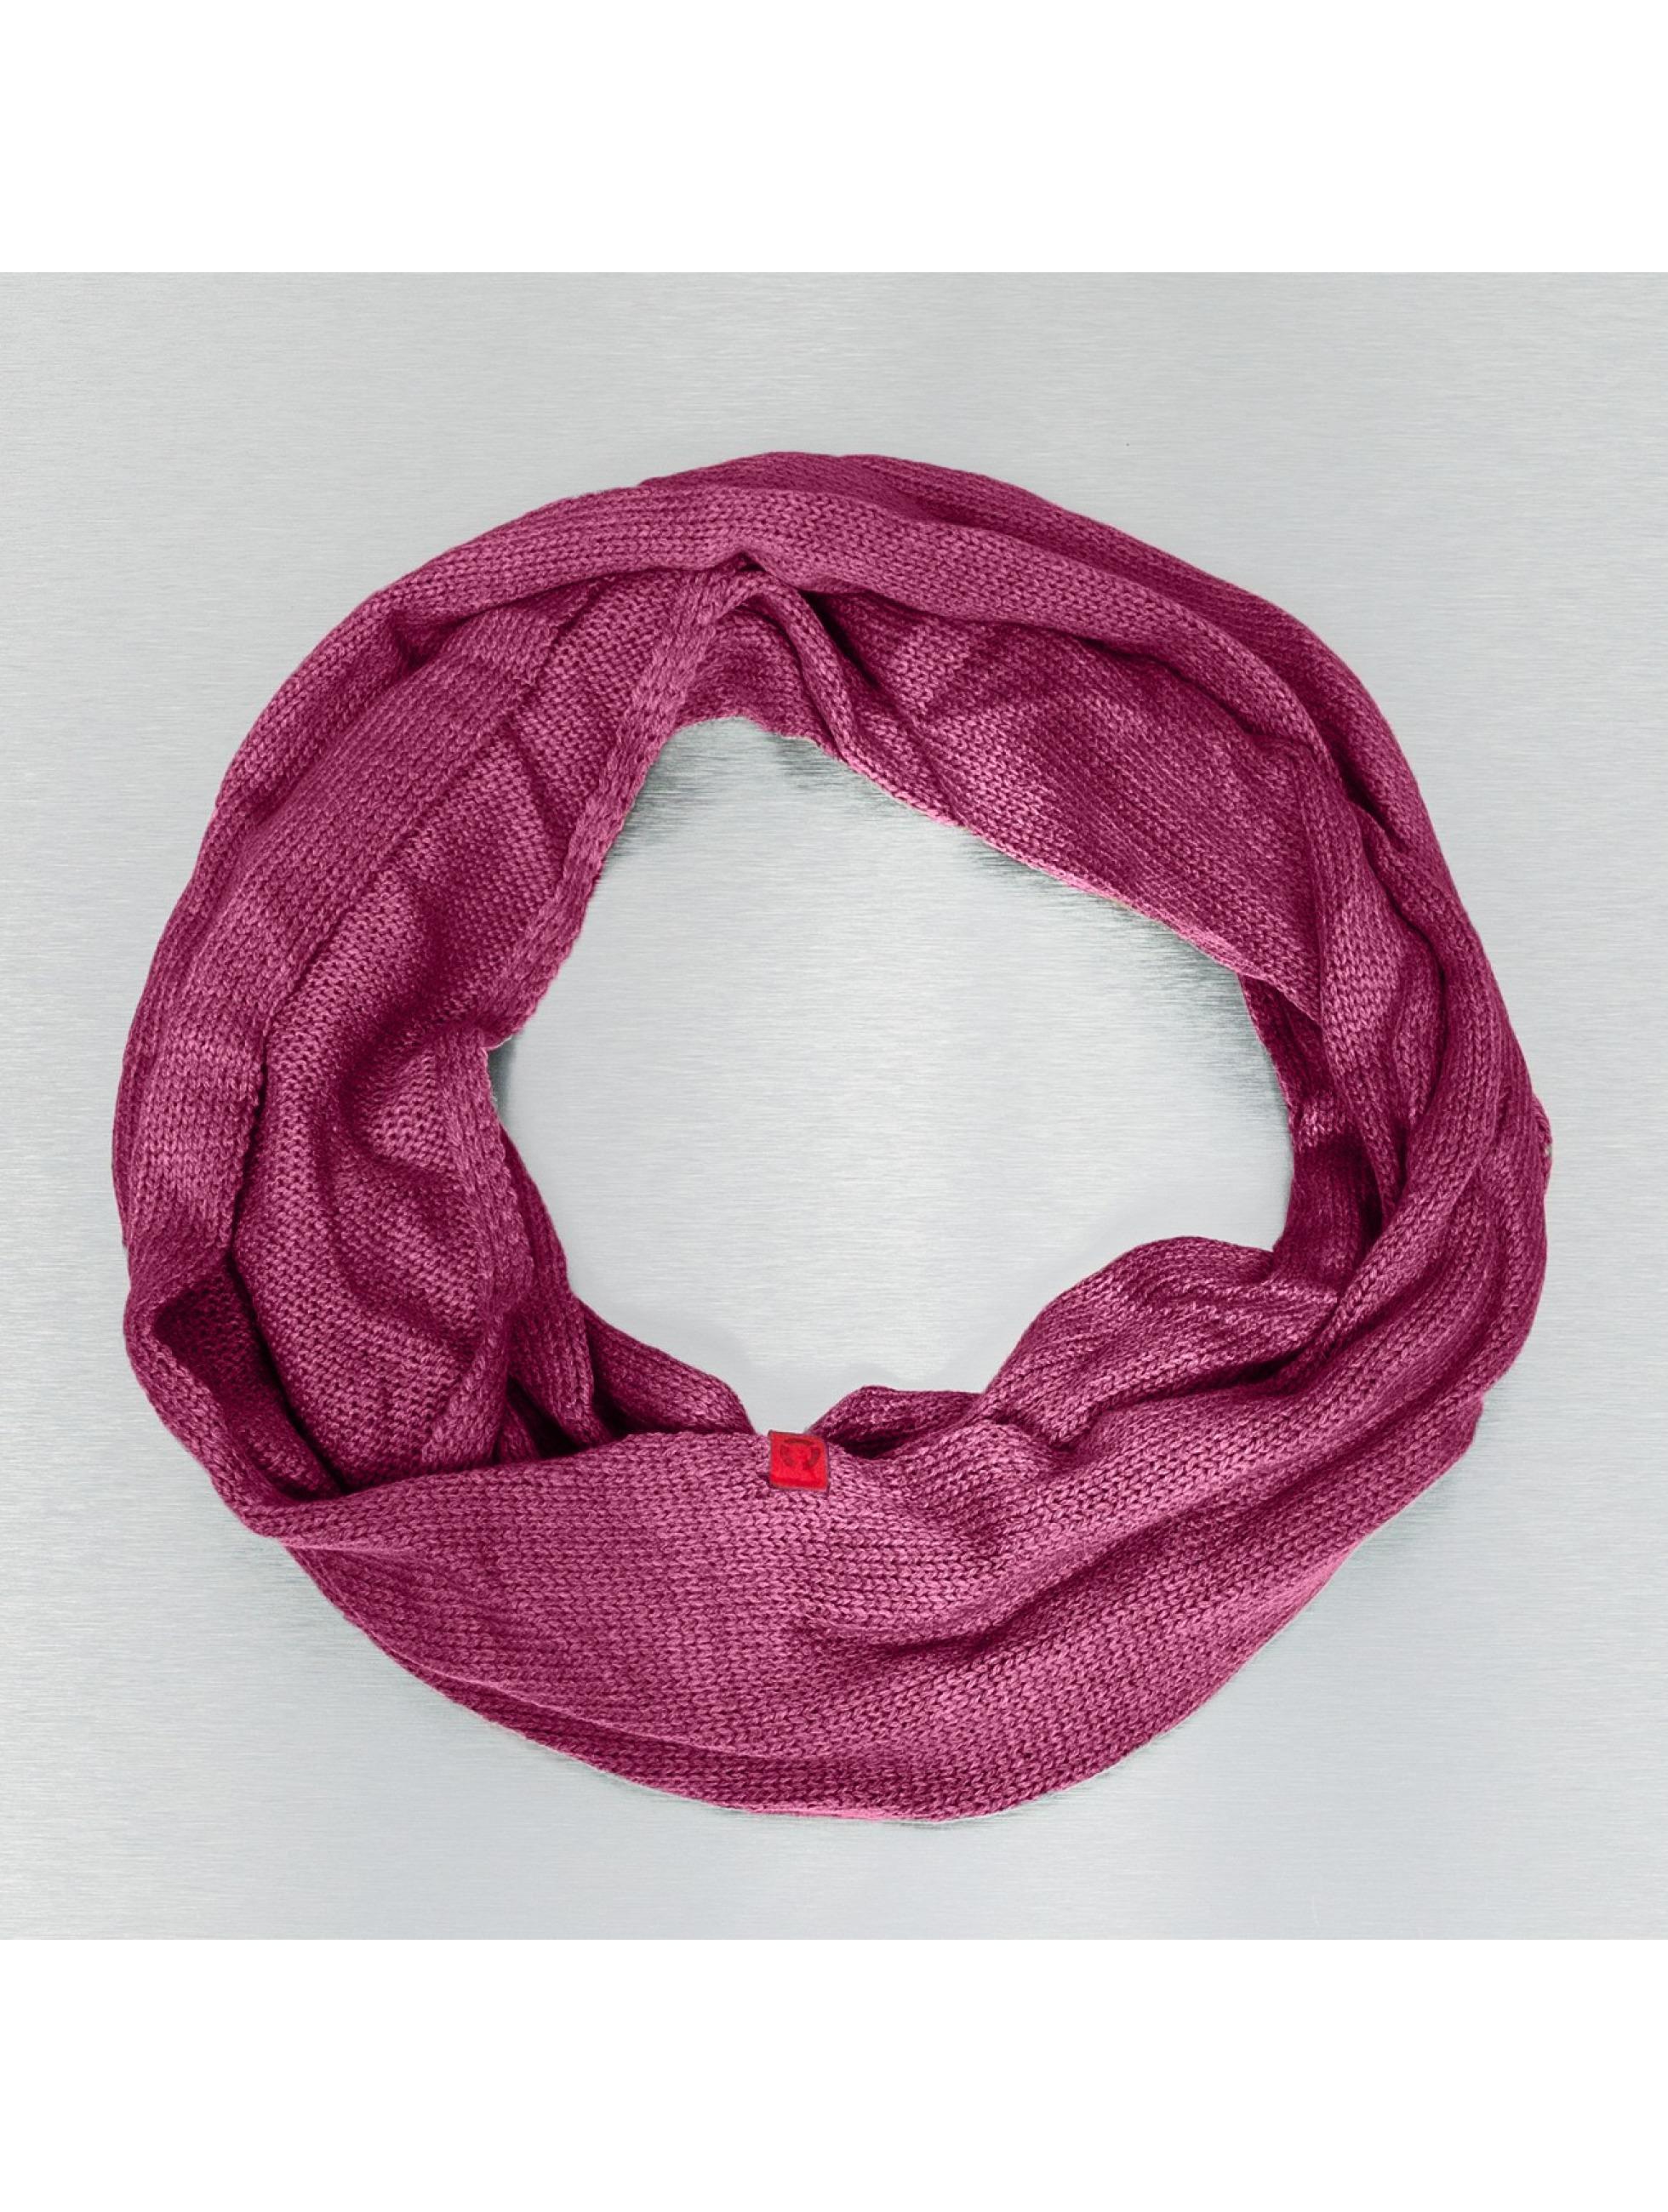 MSTRDS Echarpe Plain Loop rouge